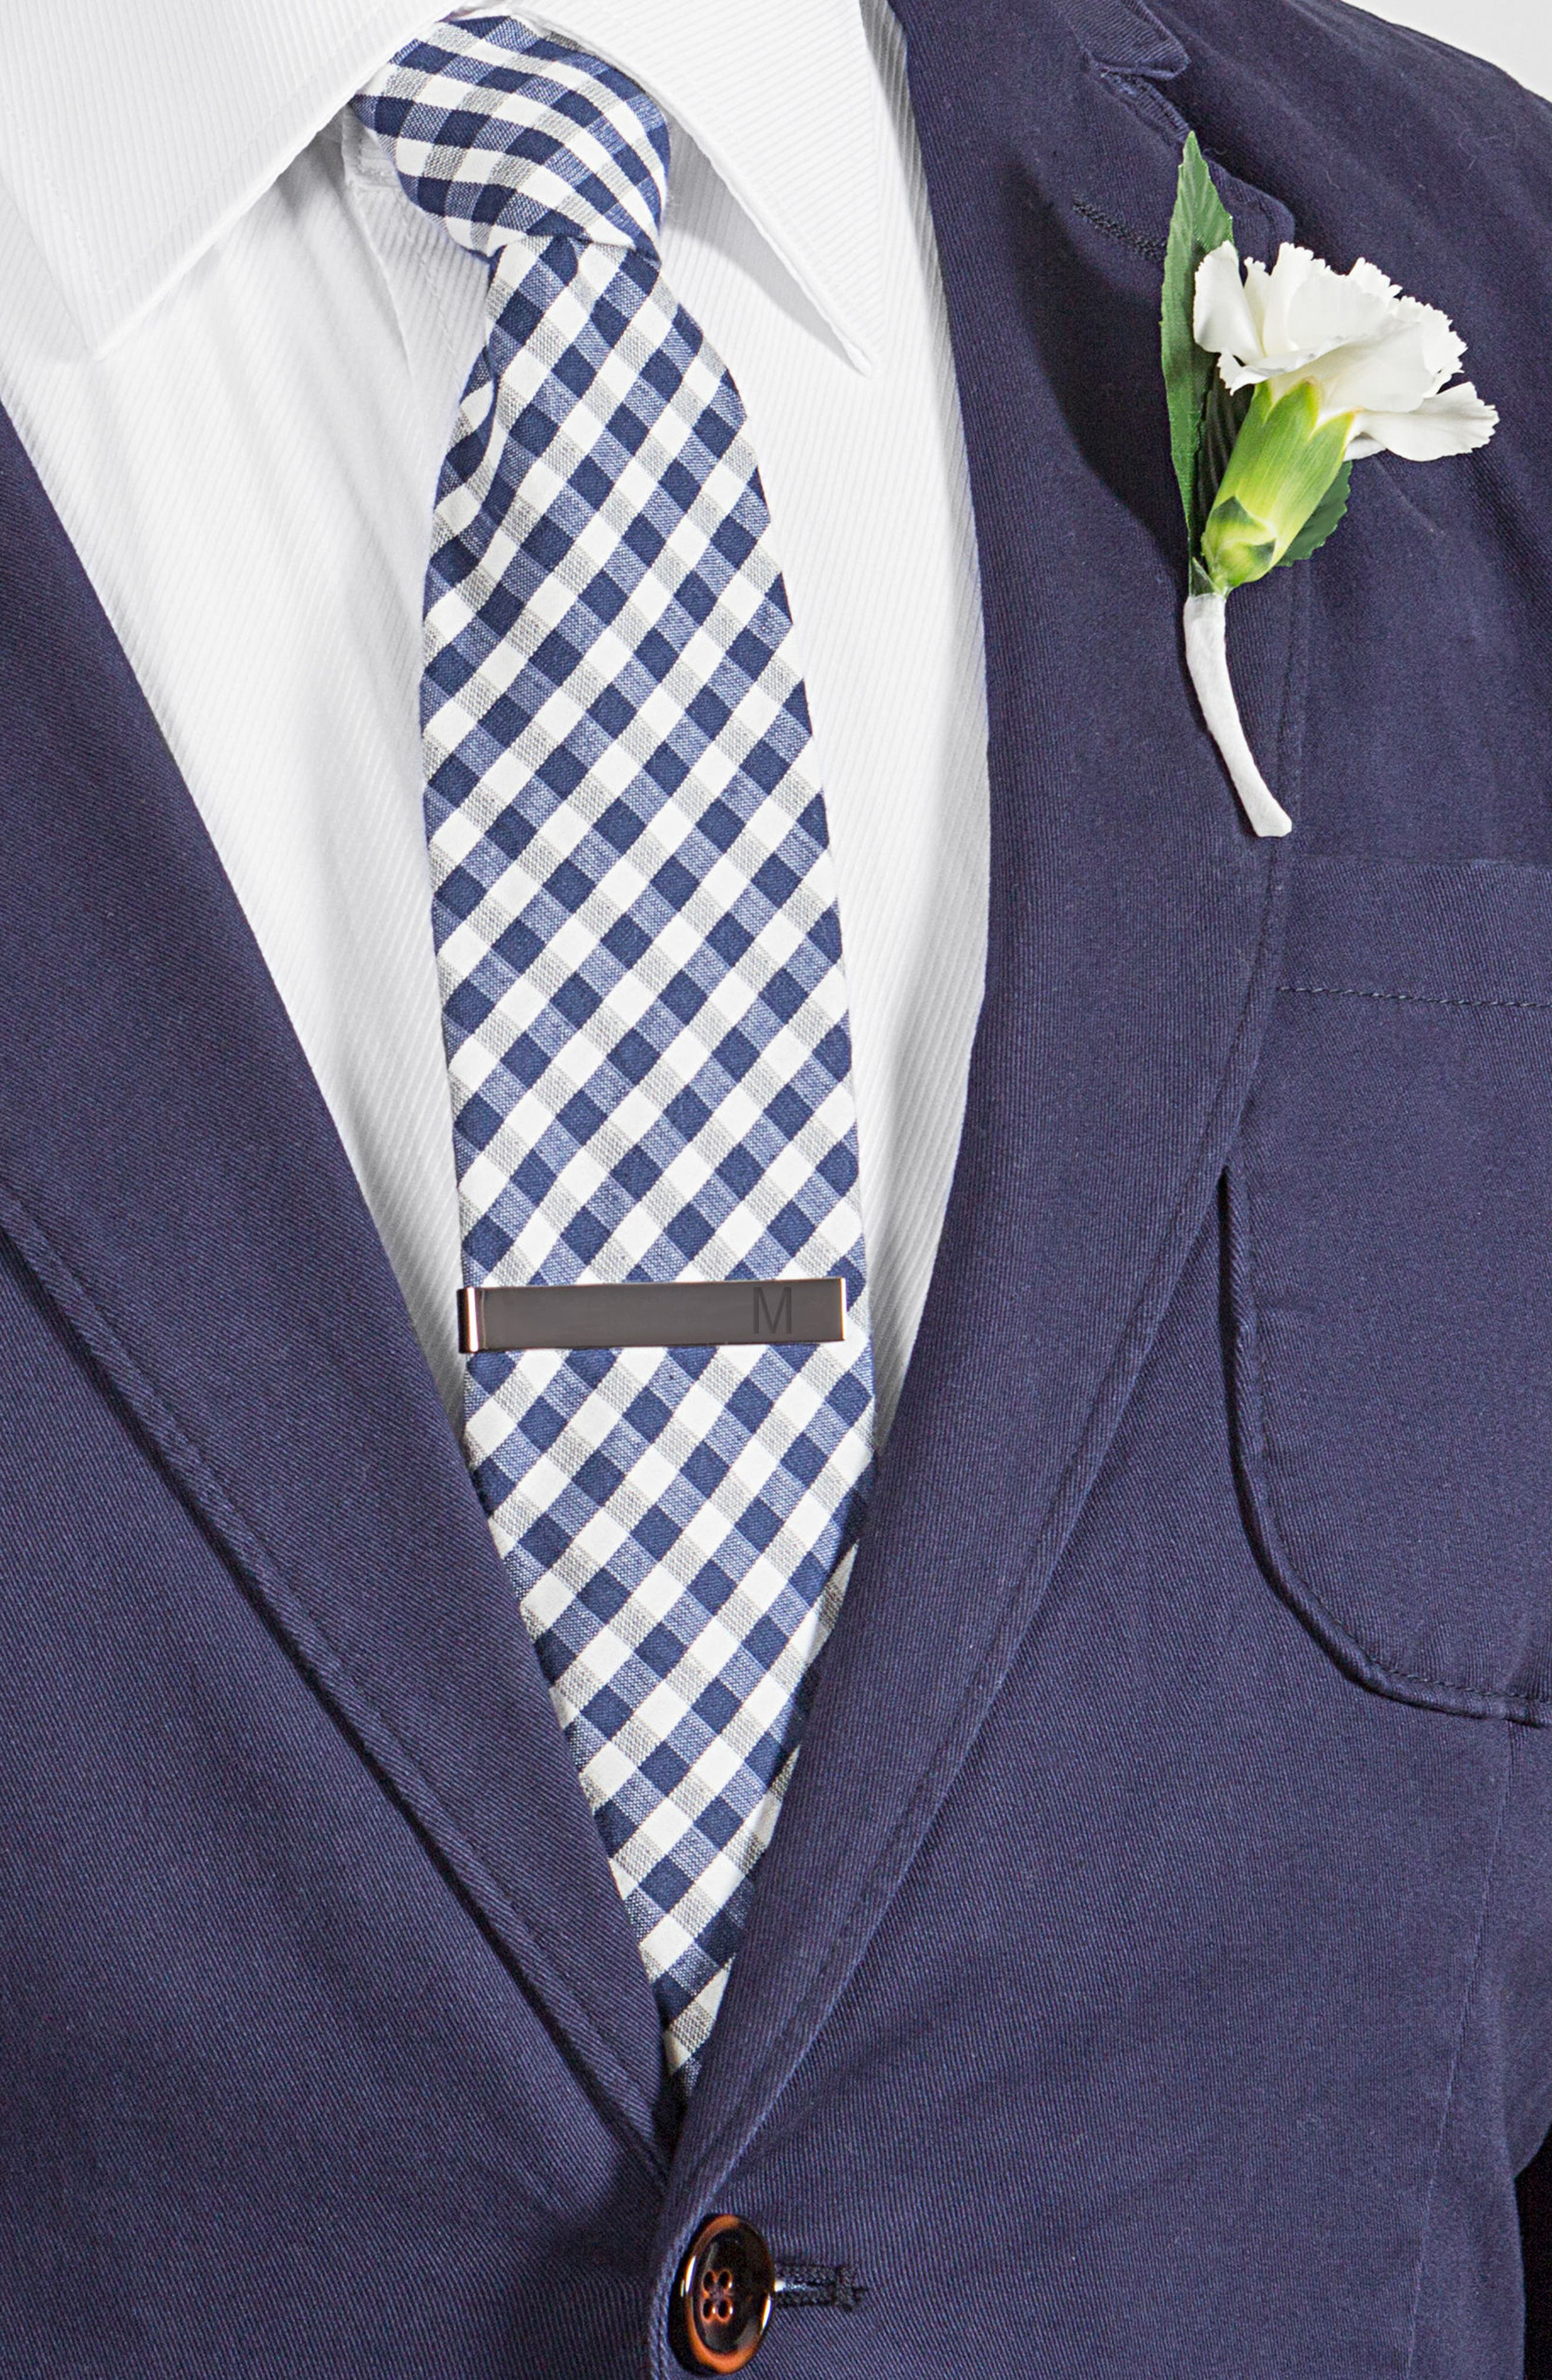 Monogram Tie Clip,                             Alternate thumbnail 3, color,                             020